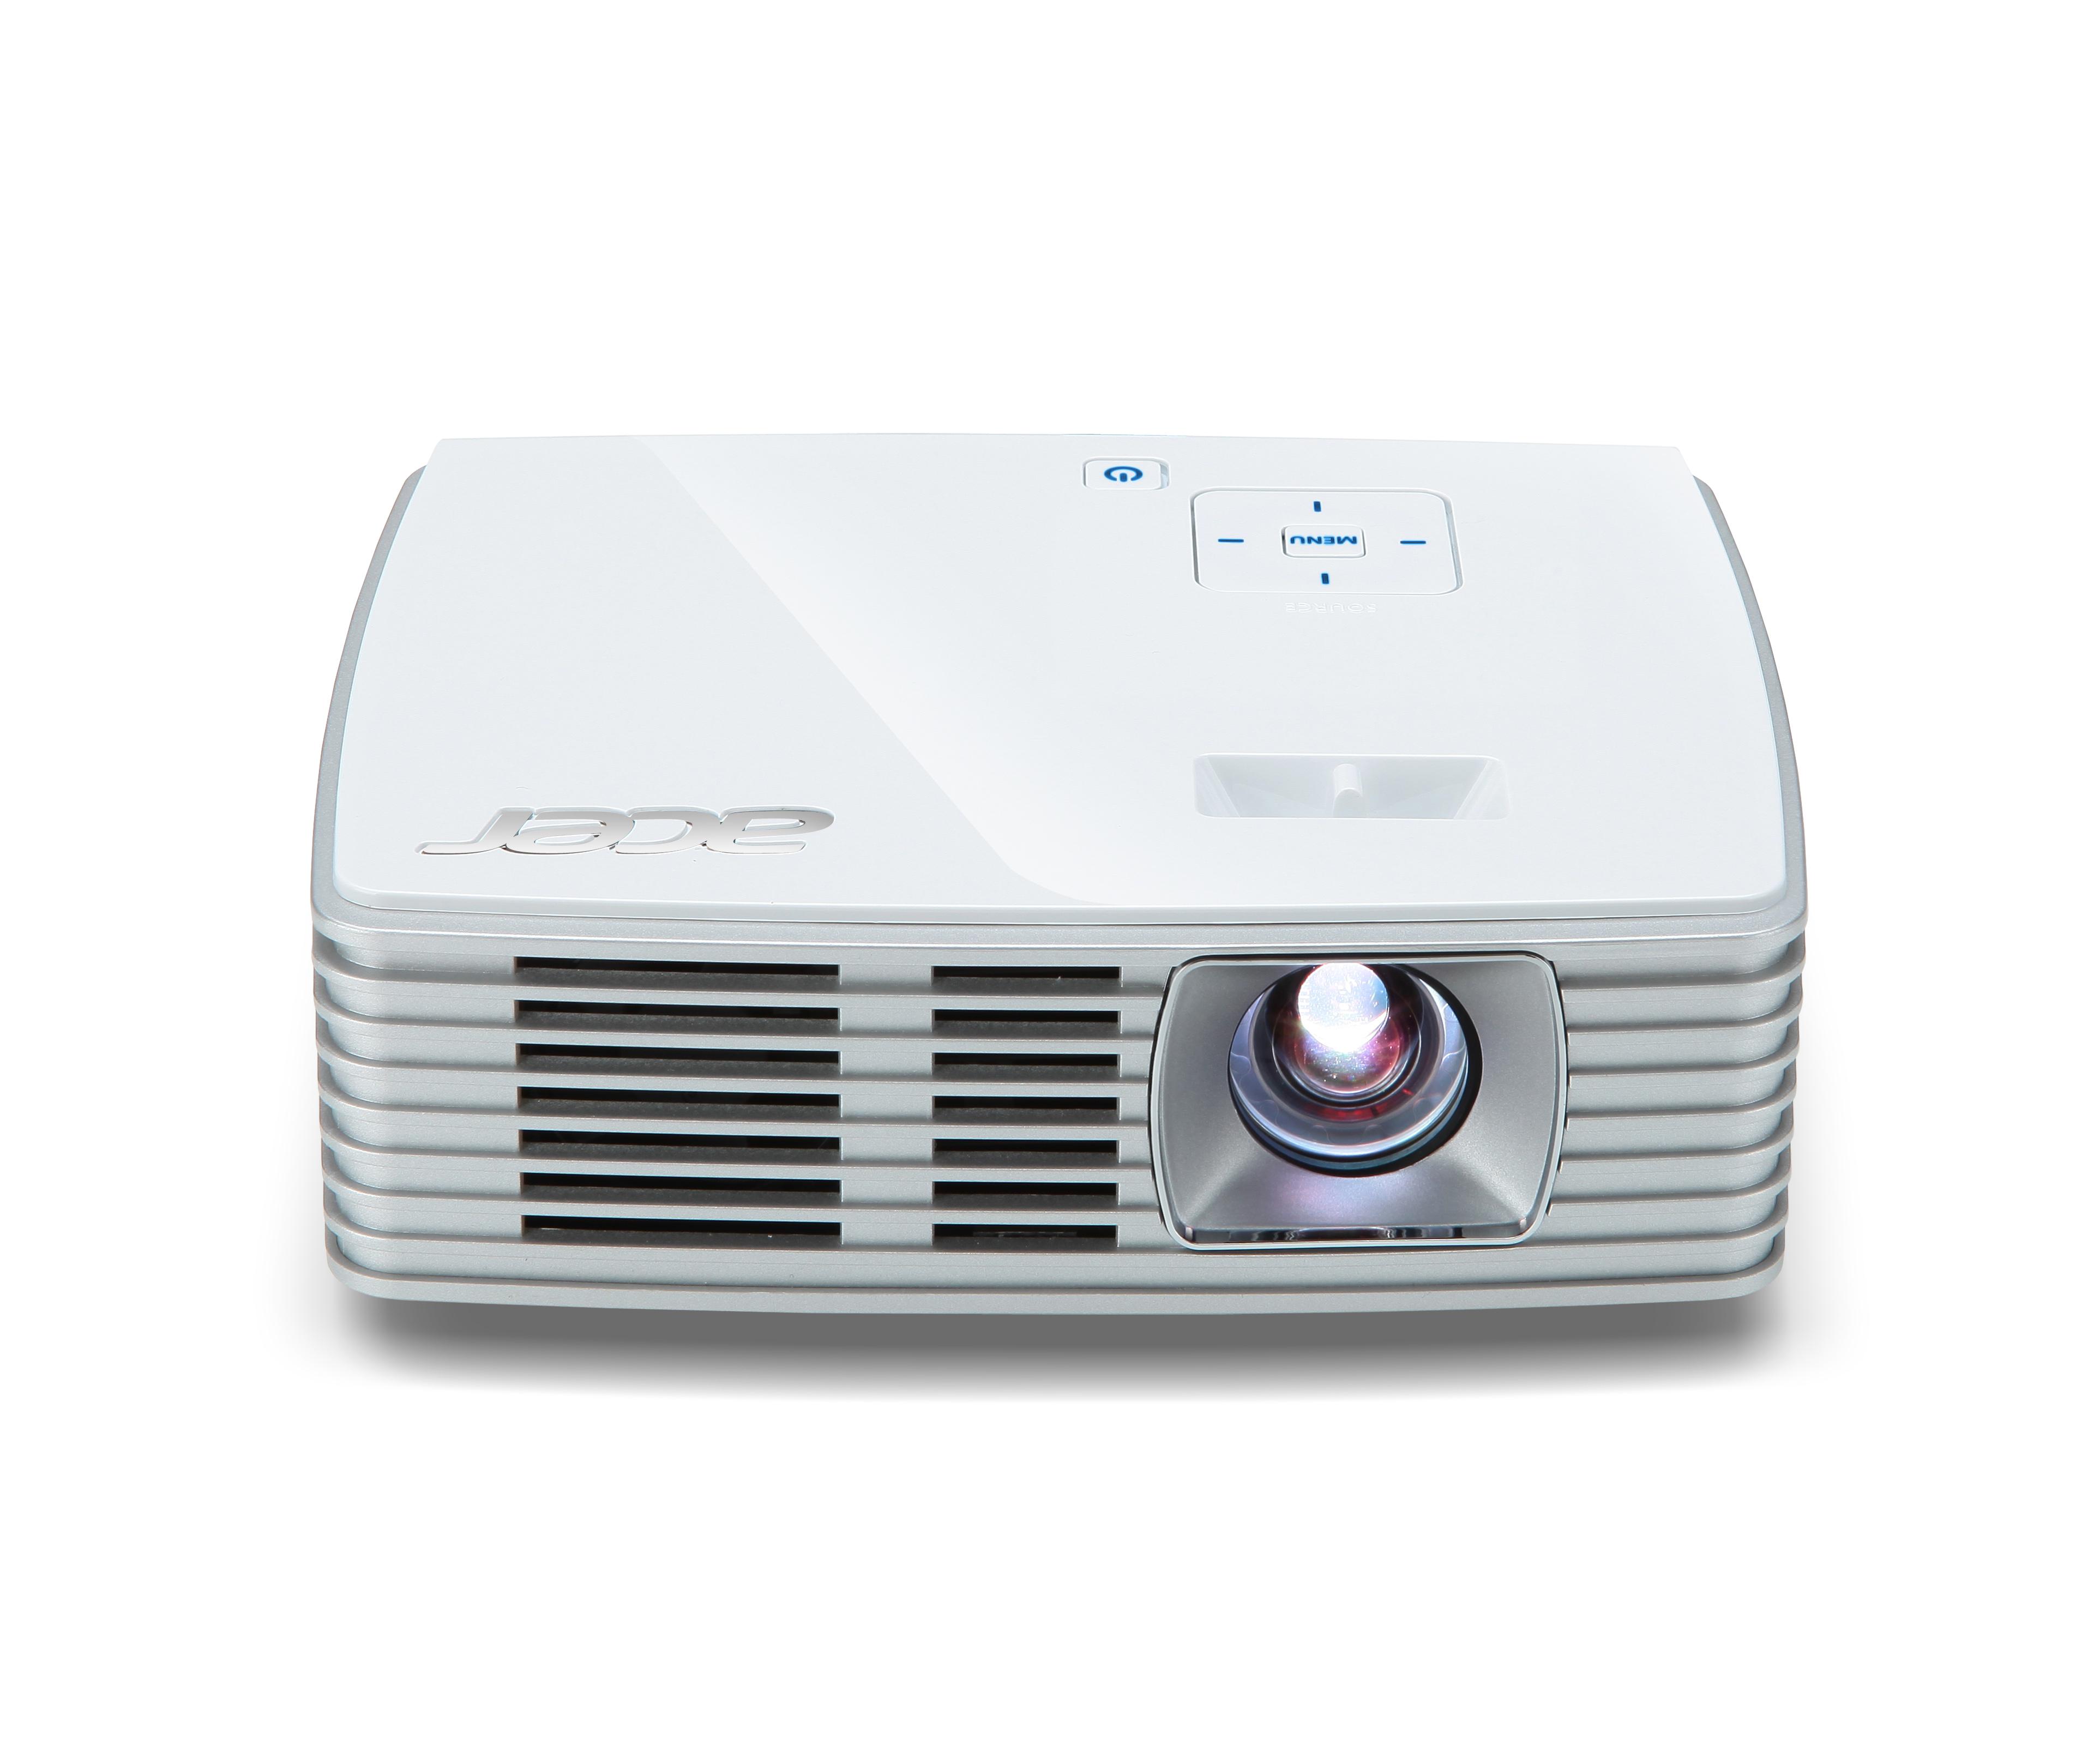 ACER K135i DLP LED Projektor 600ANSI Lumen 3D ready WXGA 1280x800 10000:1 HDMI/MHL 24-pin Universal I/O USB A SD inkl. WLAN Dongle